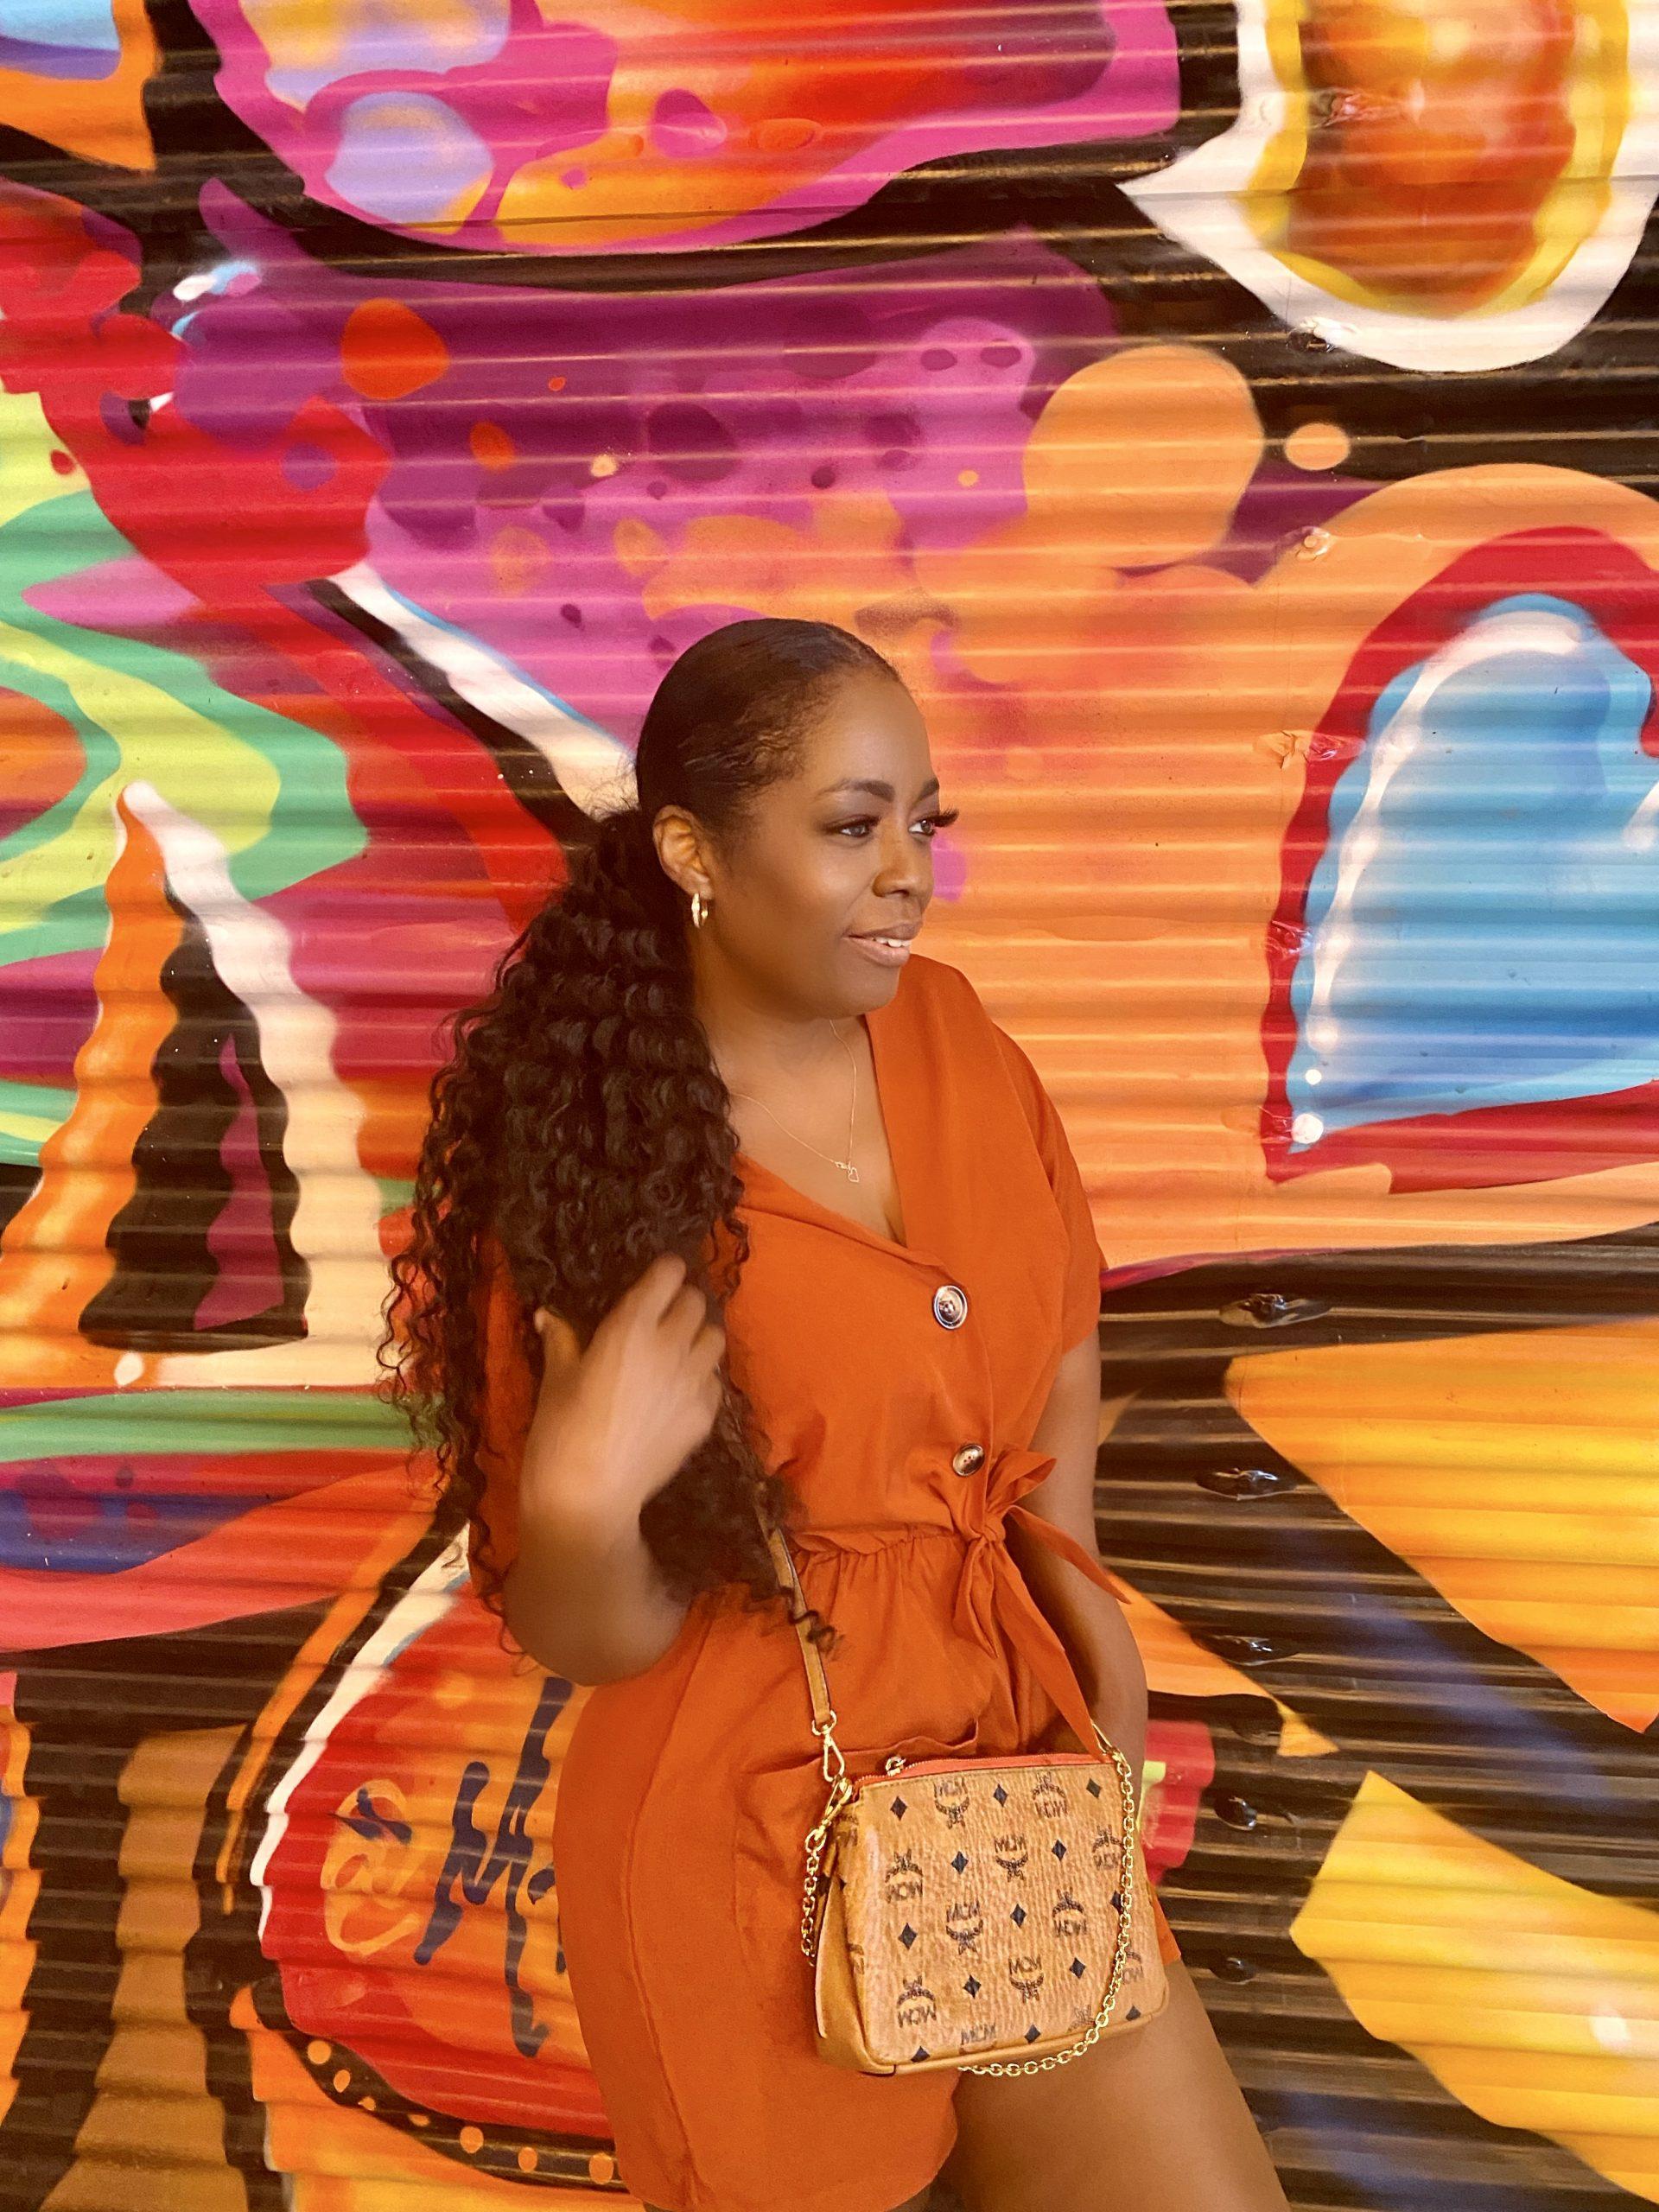 My Style: Stylish Short Sleeve Loose Romper